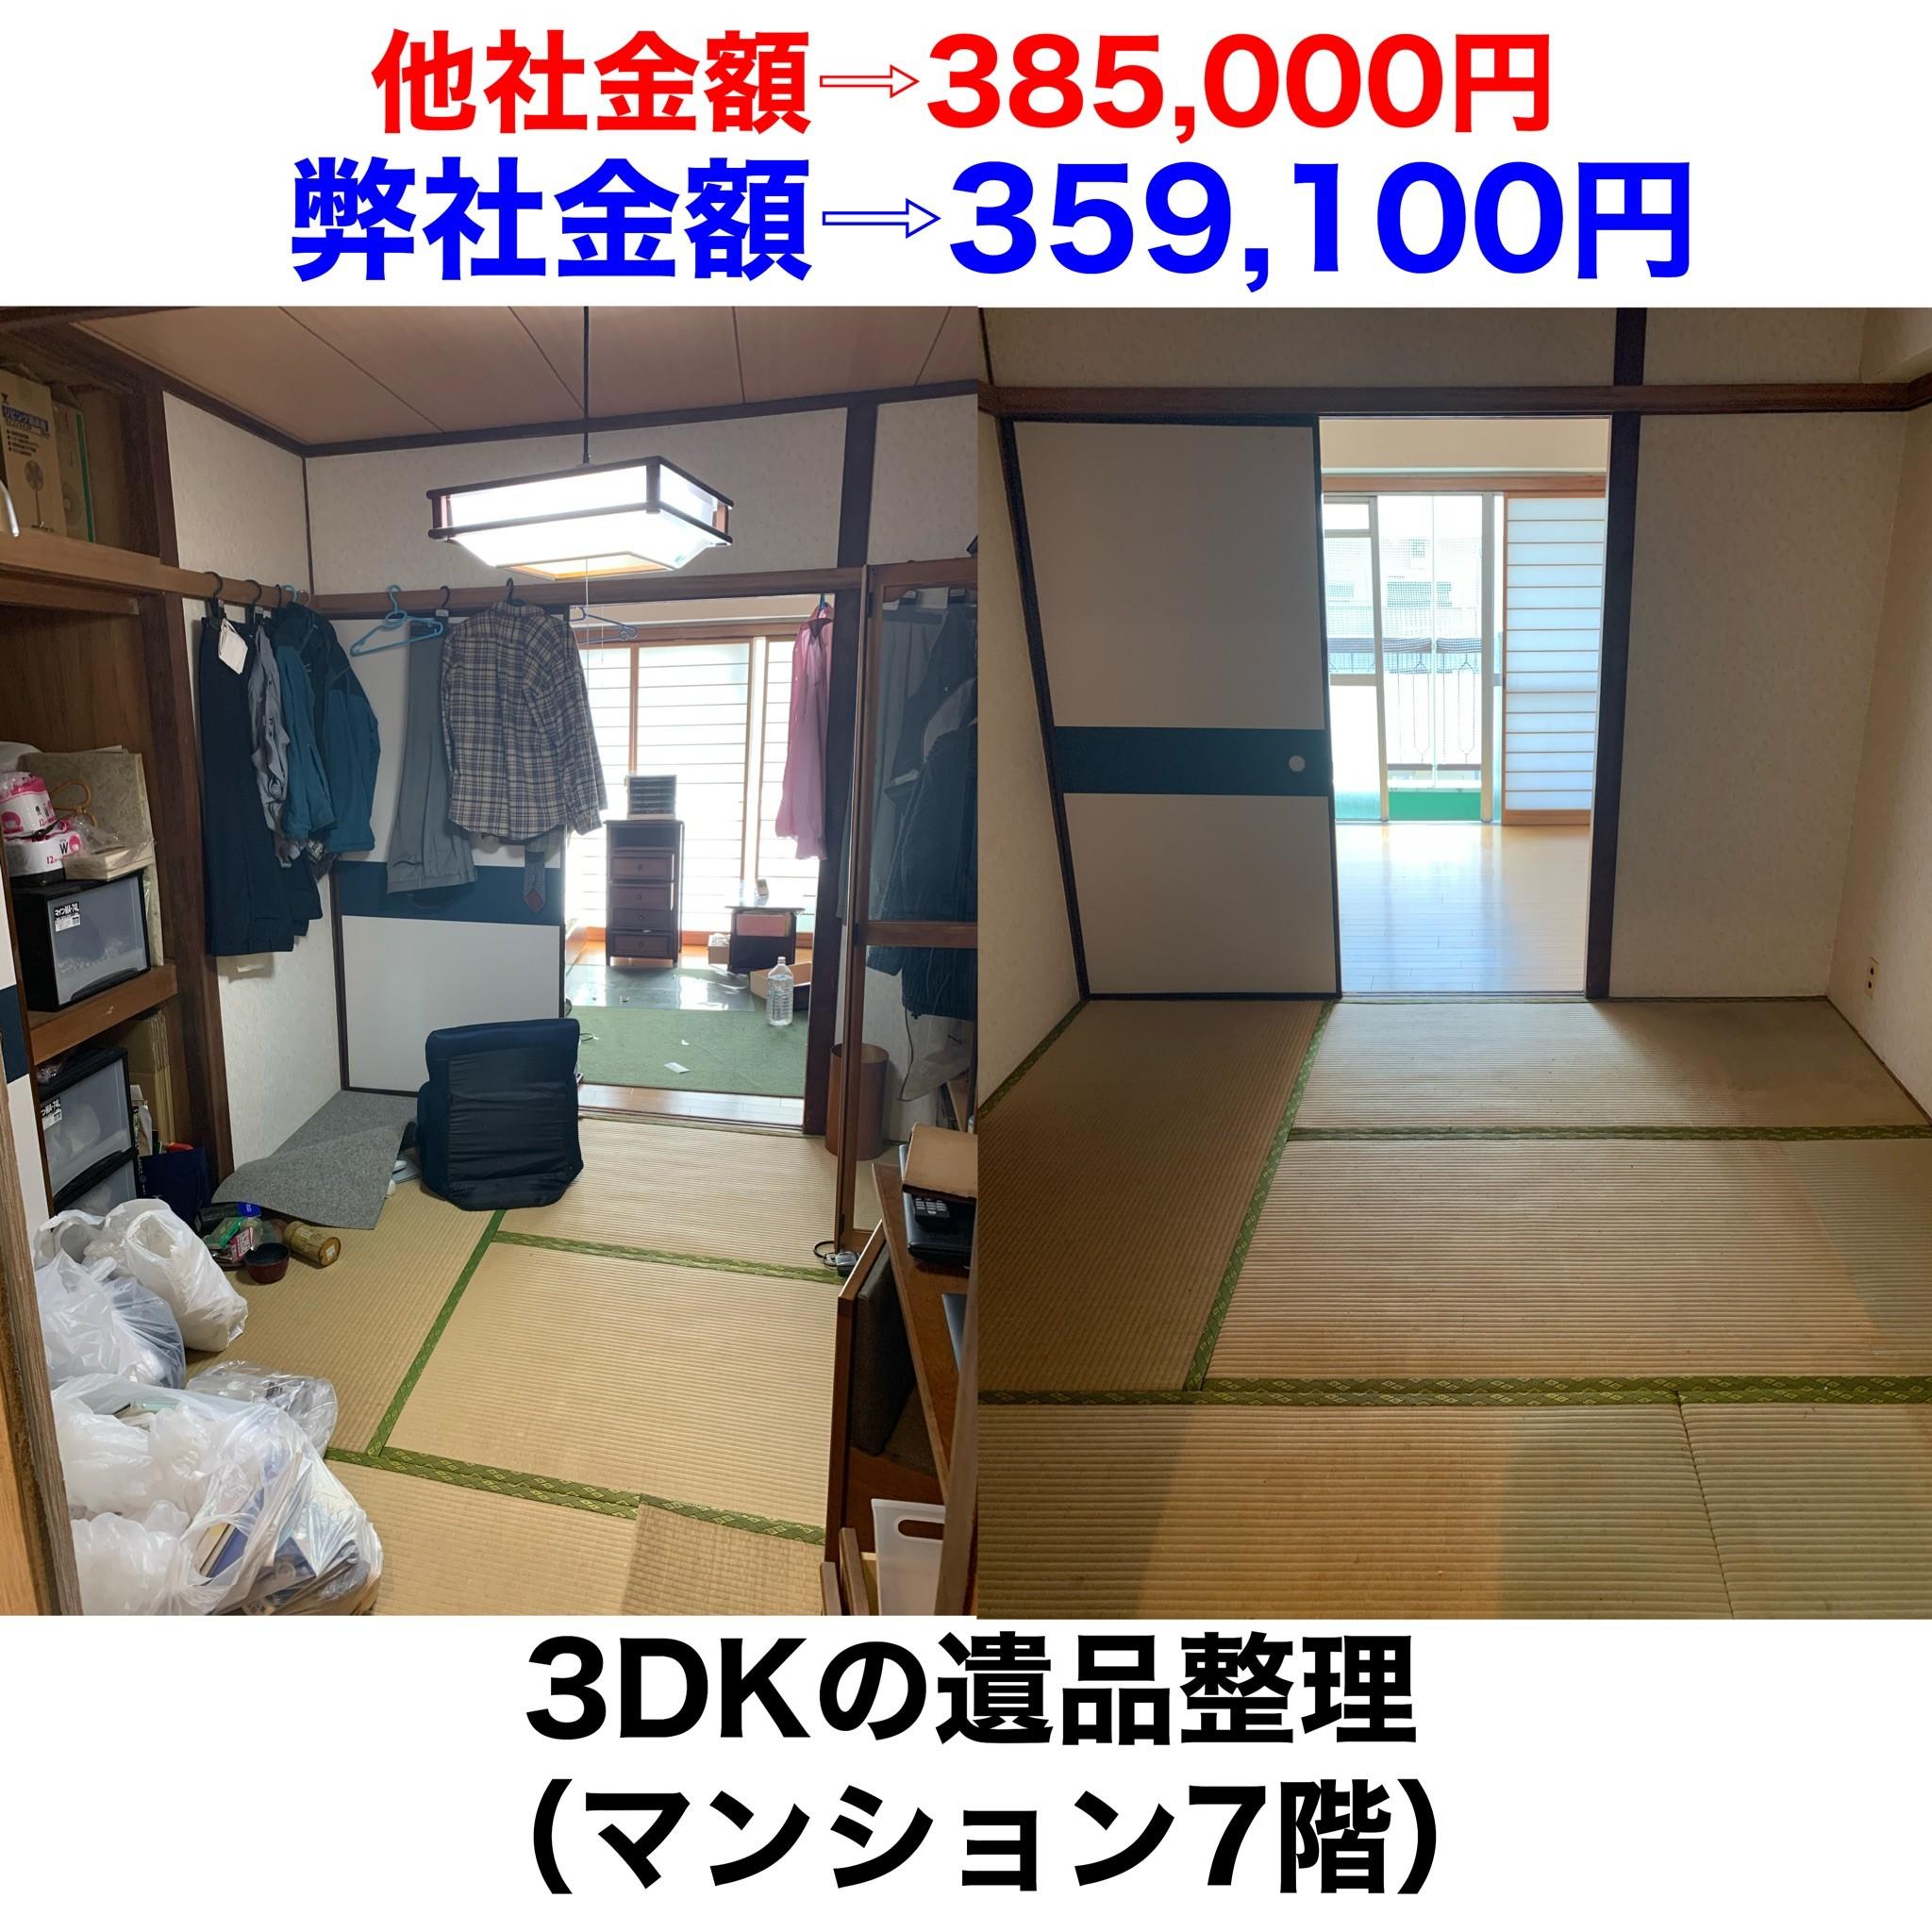 S__507224066